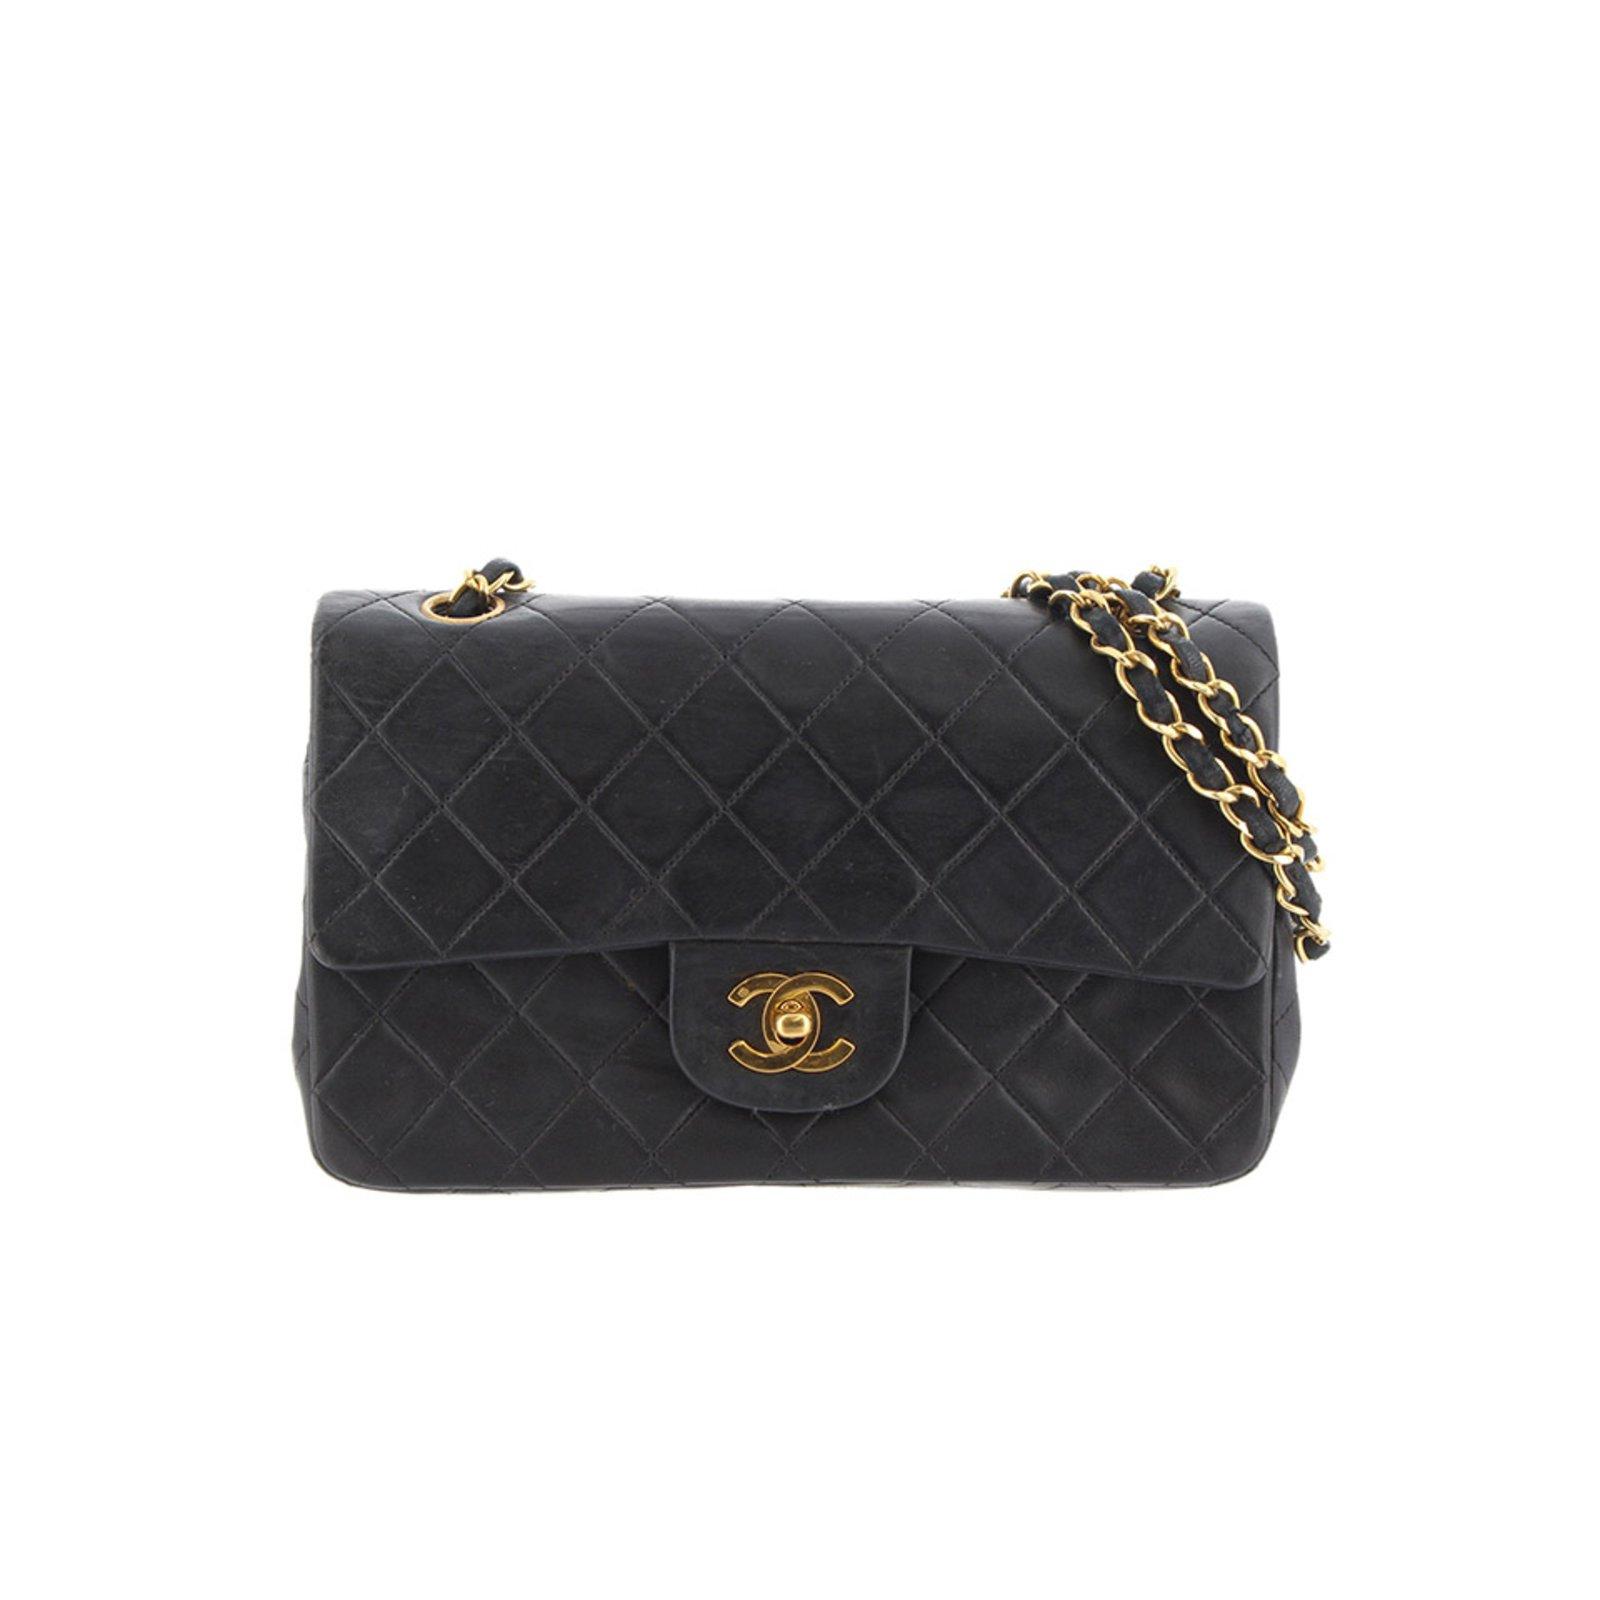 b03ec2386d36 Chanel Classic Small Double Flap Bag Handbags Leather Black ref.99188